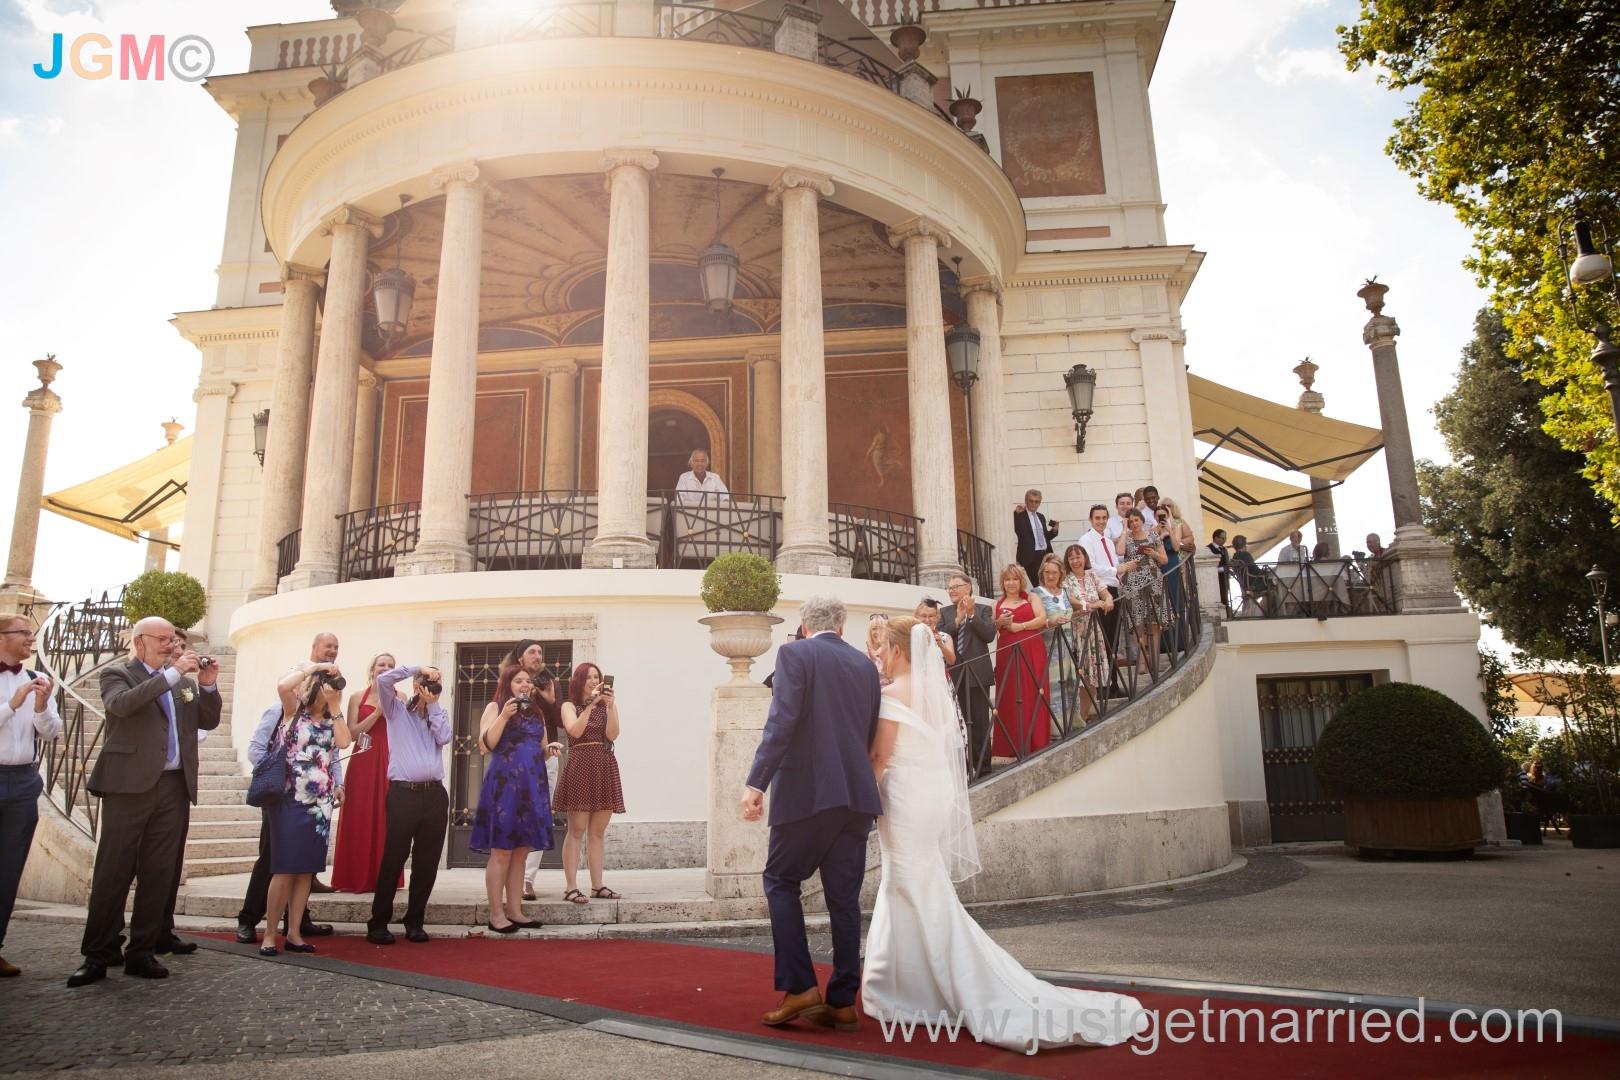 Campidoglio Wedding Photo Gallery, Chris